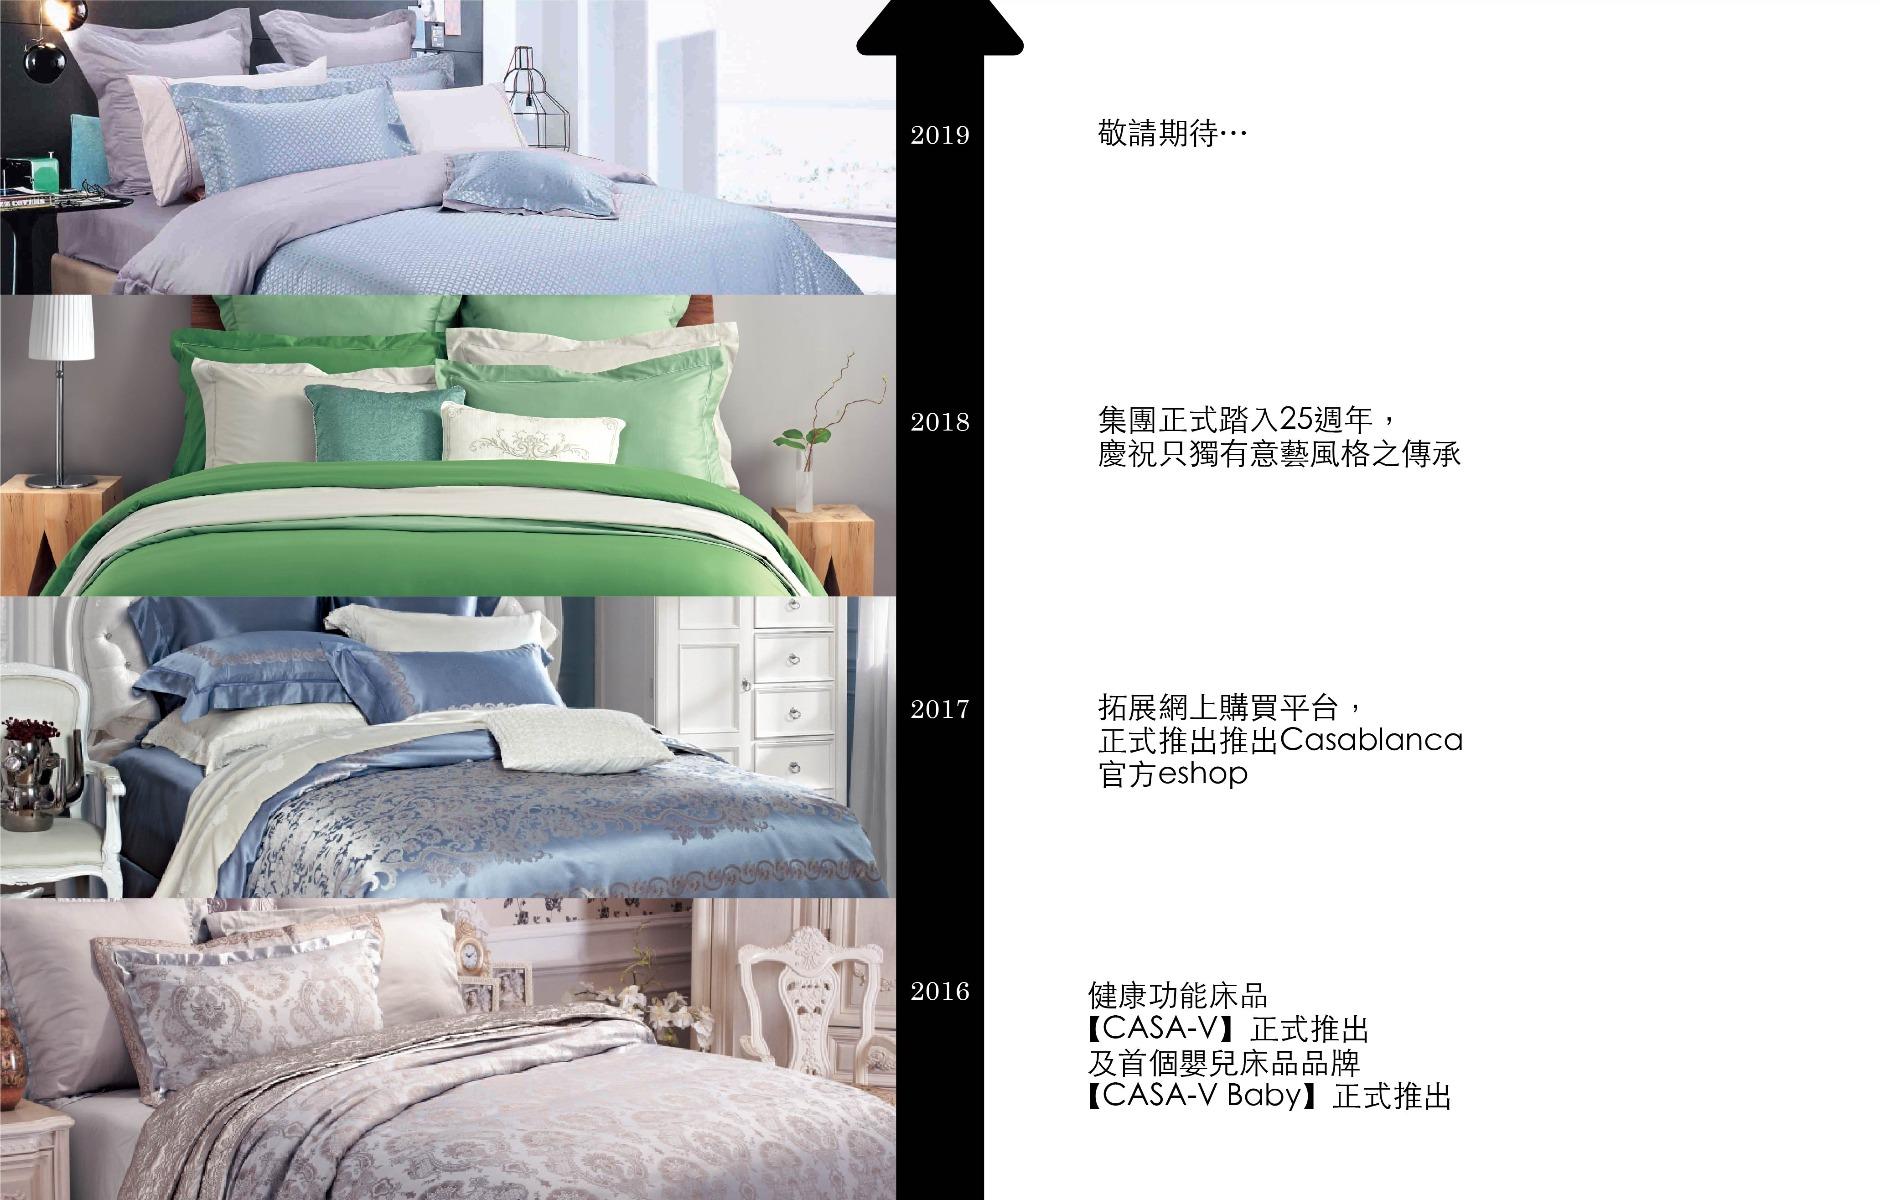 brand_story_0829-06